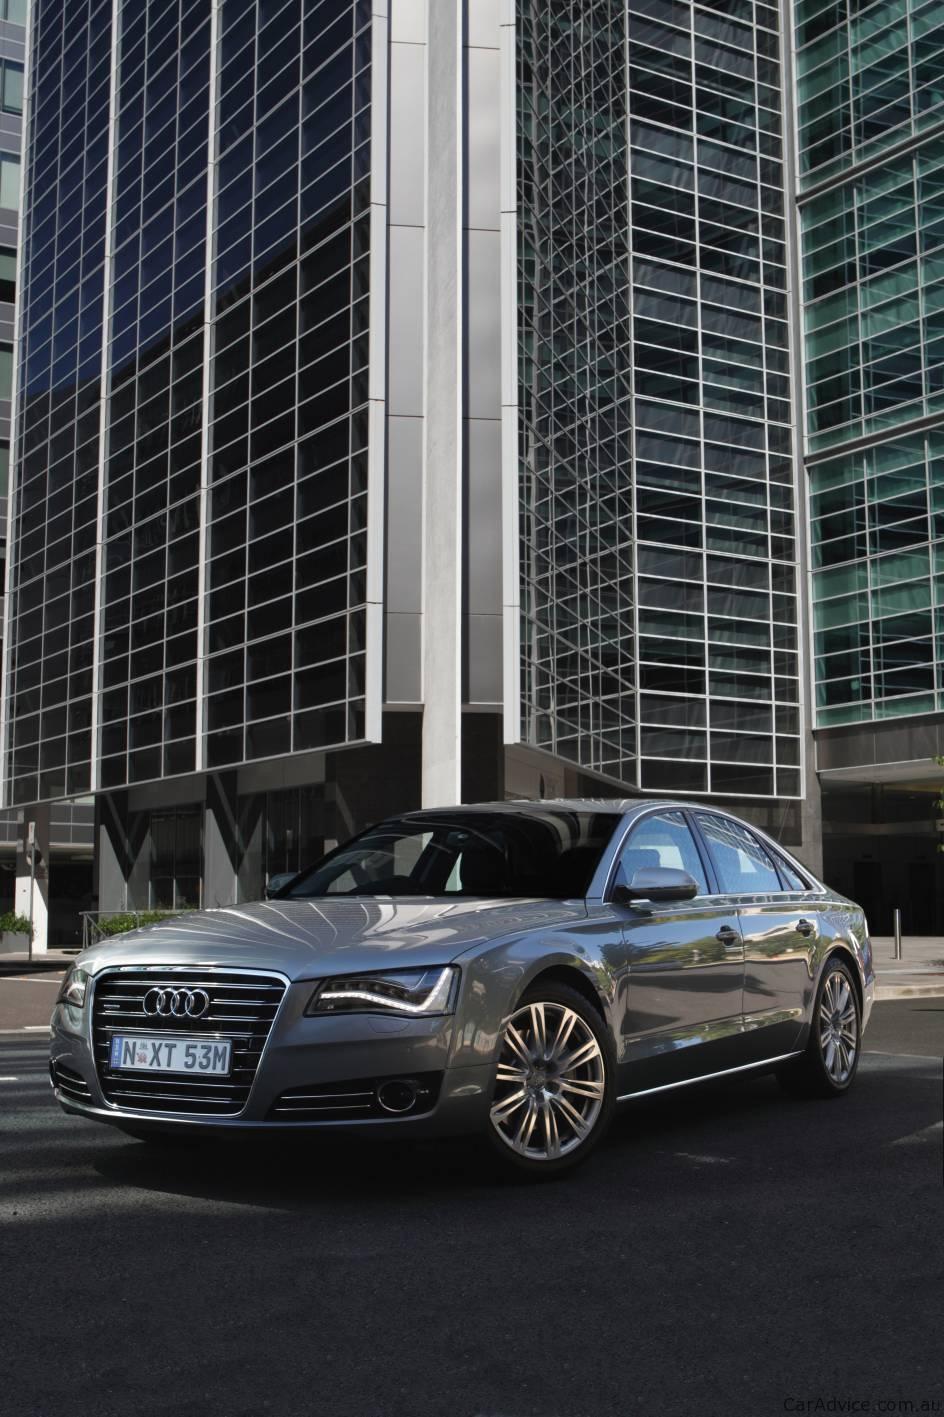 2011 Audi A8 range gets 3.0 TDI, 4.2 TDI engines - photos ...